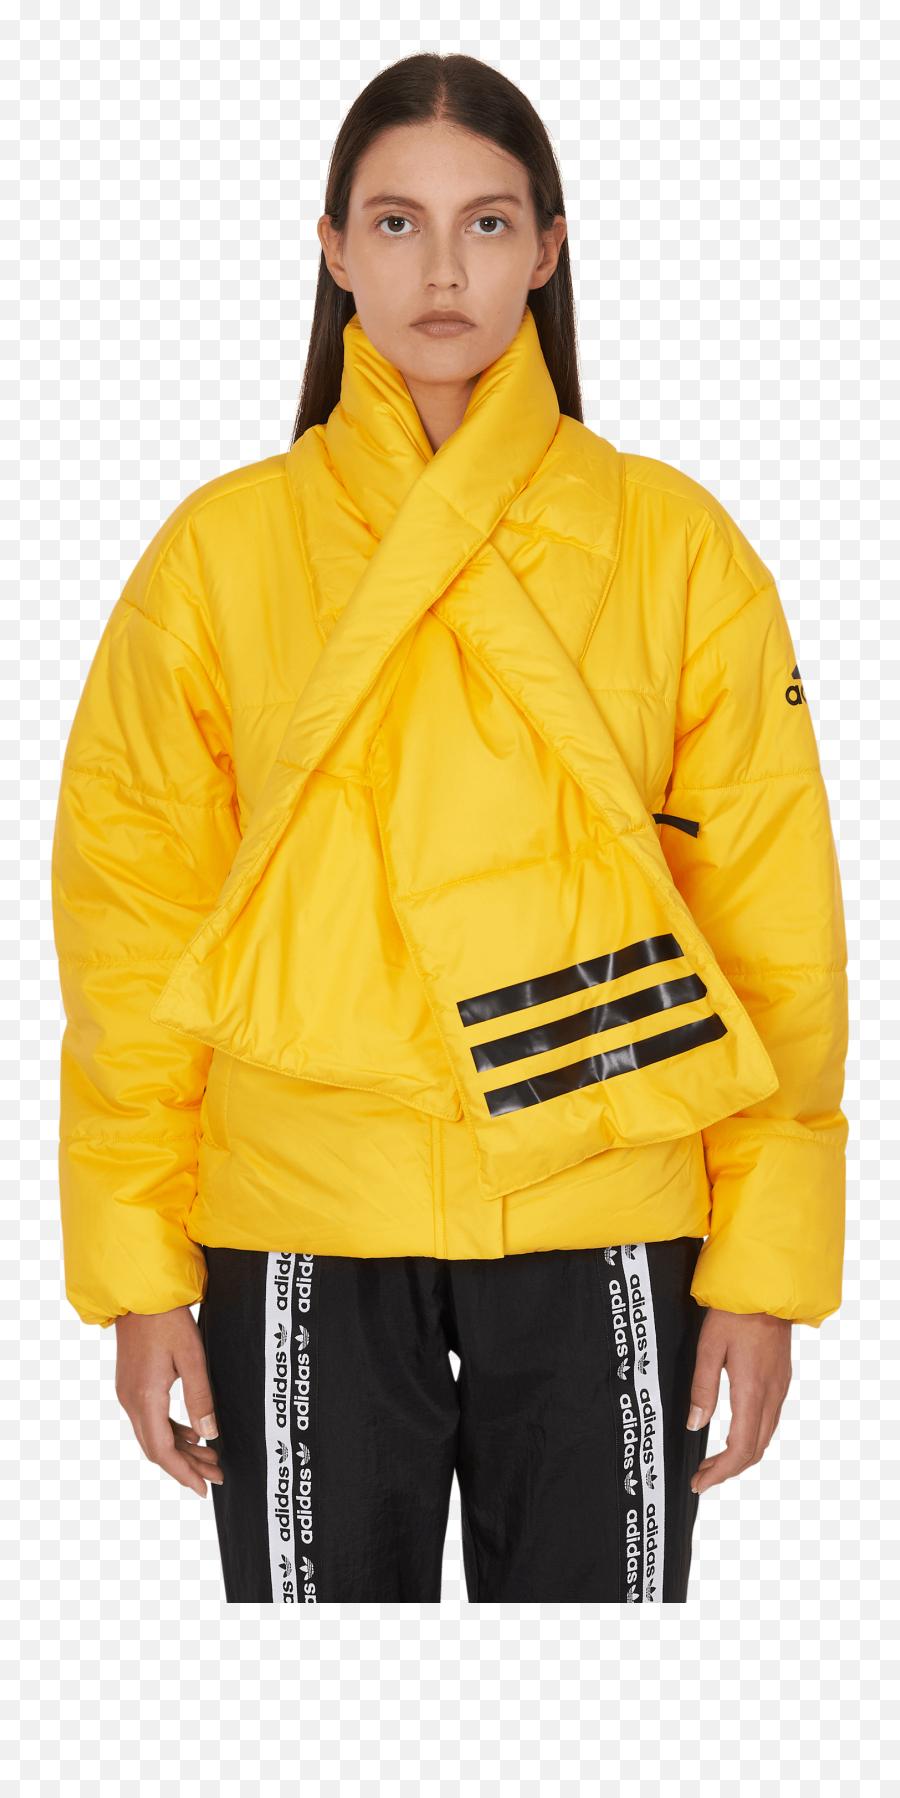 canal Exquisito toma una foto  Adidas Originals Big Baffle Bomber - Pull Lacoste Jaune Femme png - free  transparent png images - pngaaa.com